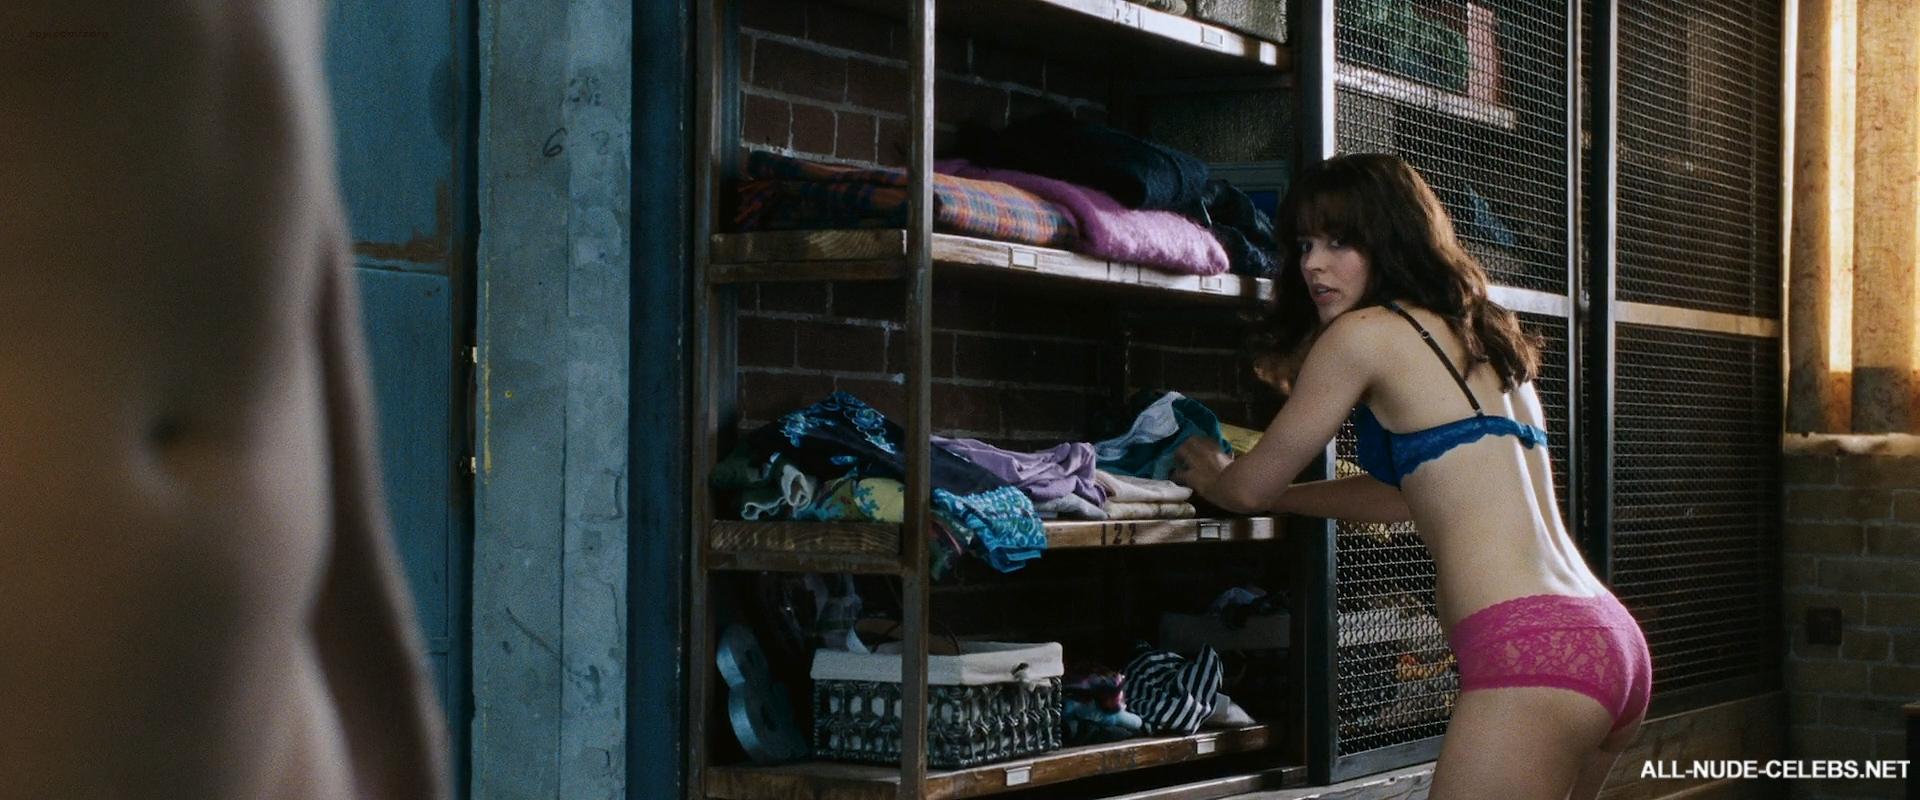 Rachel mcadams nude preston ward condra's windows of fun